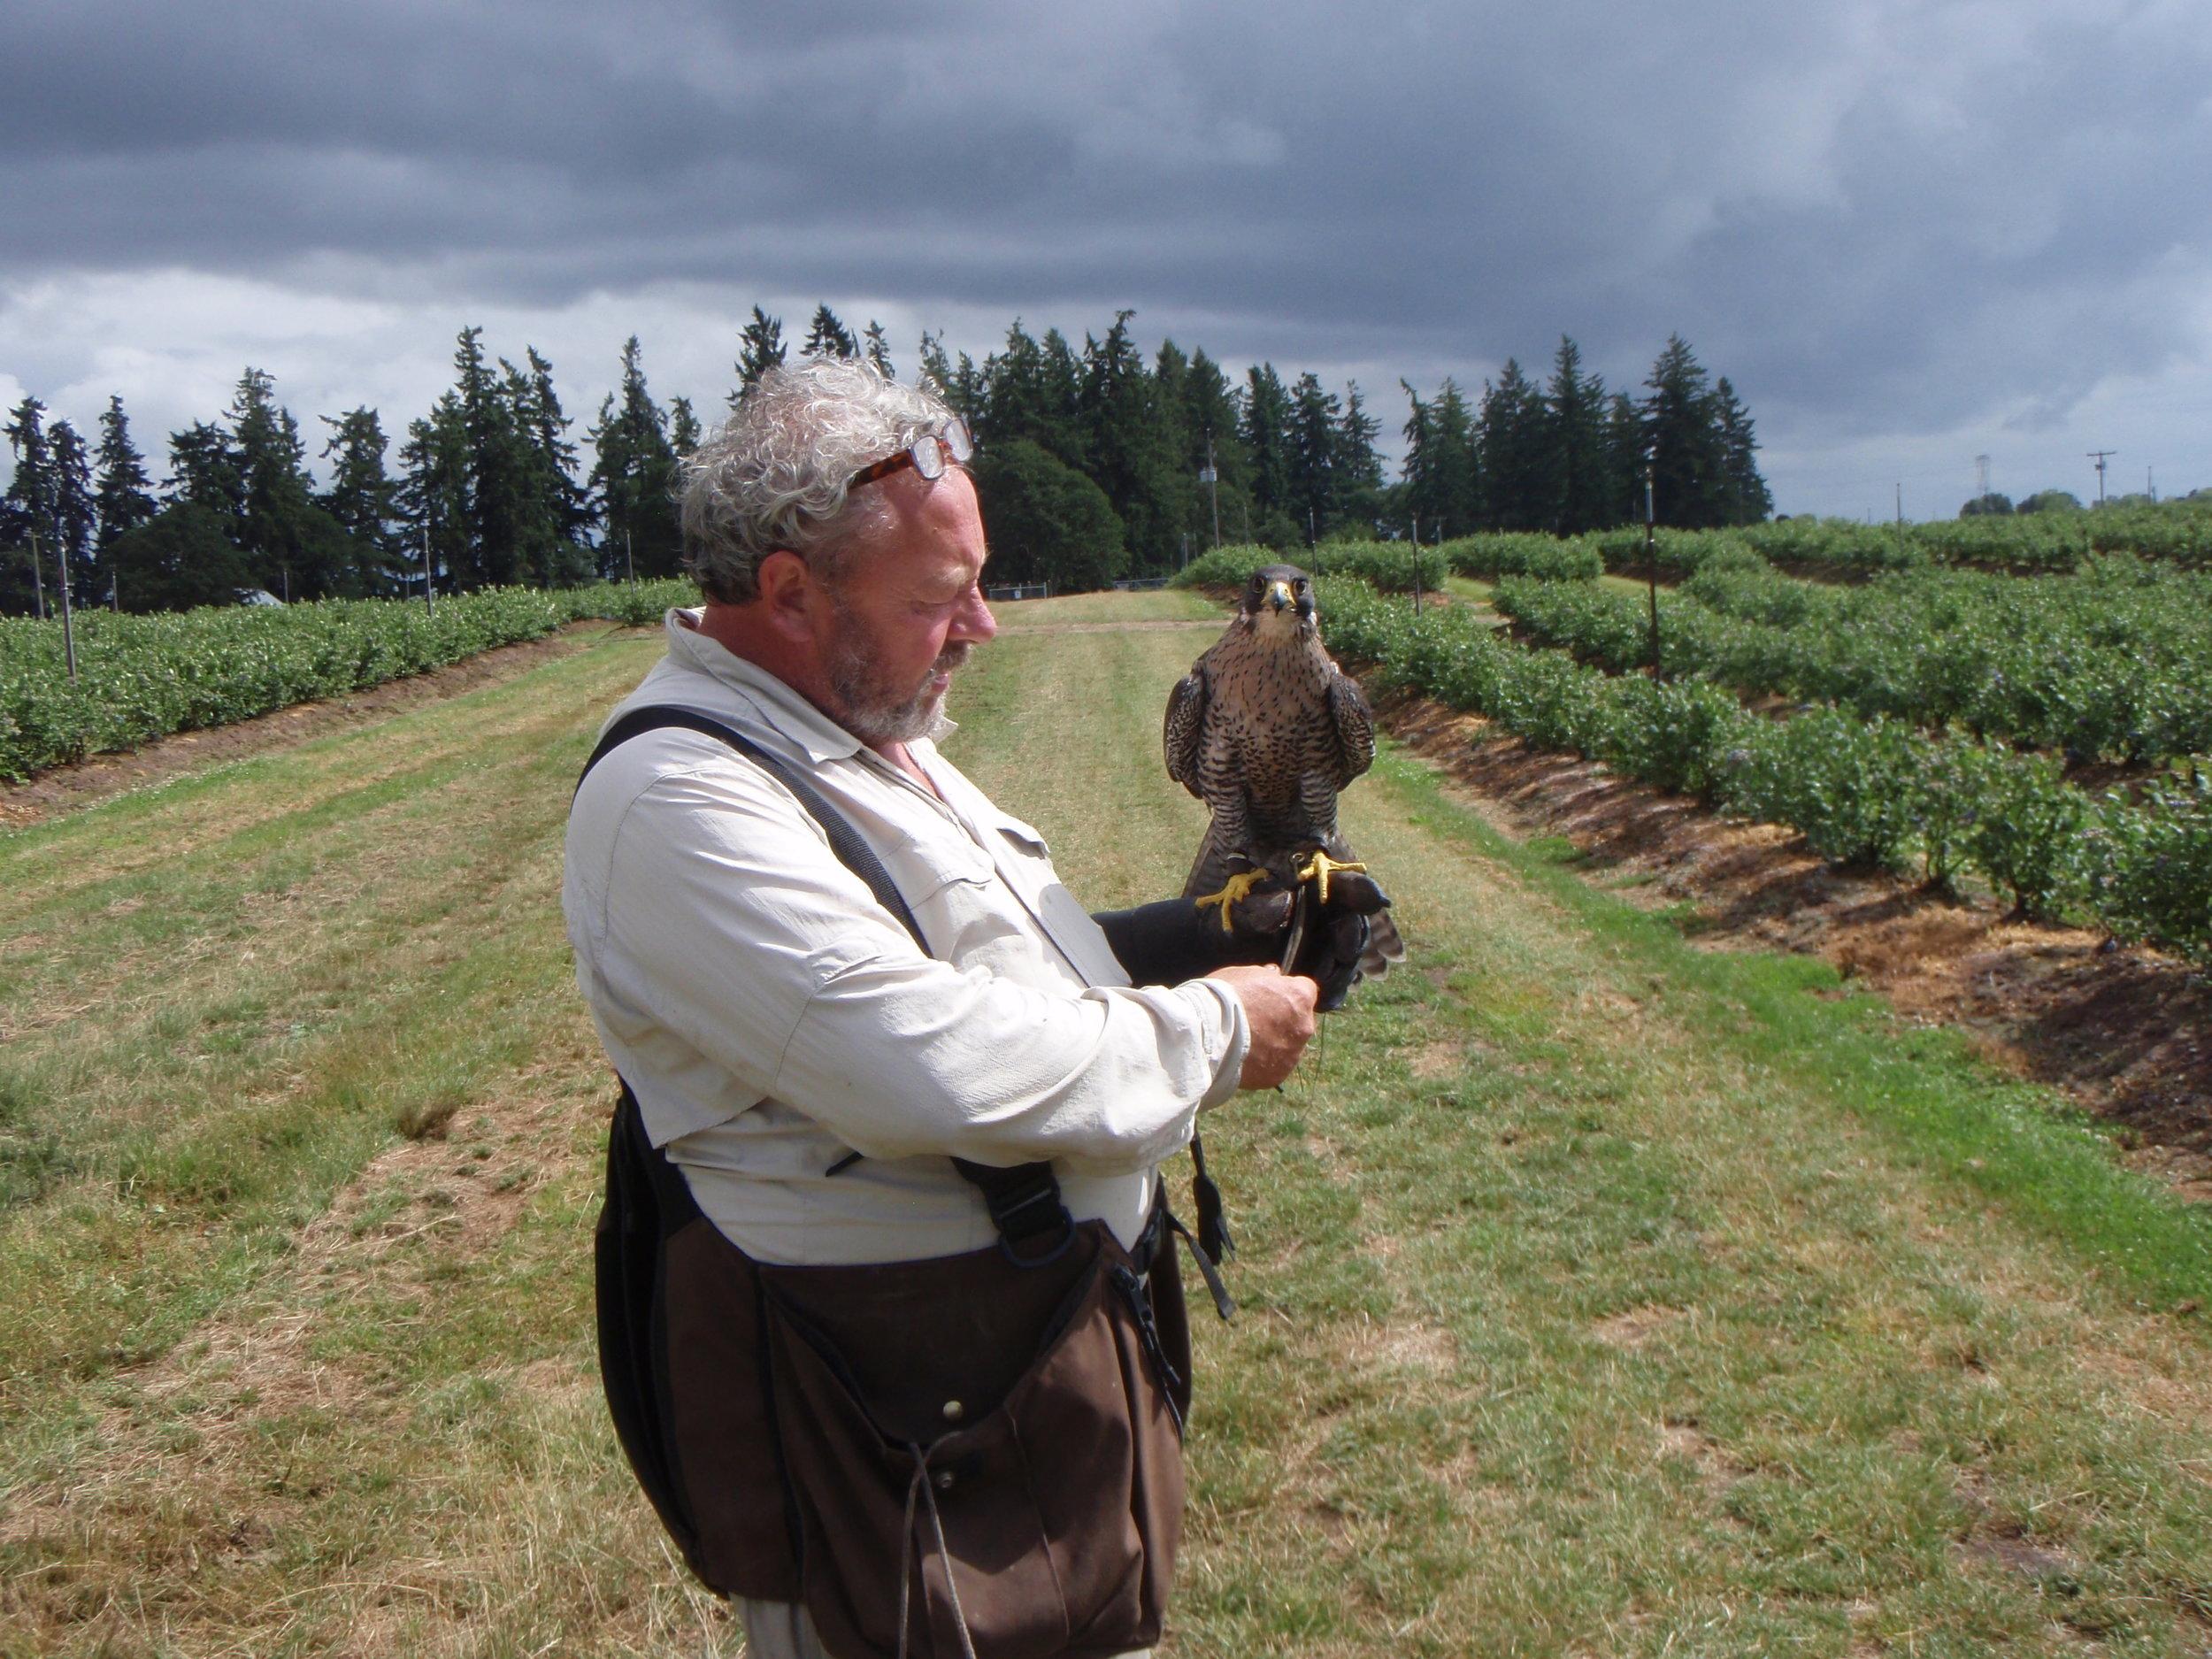 Falconer with bird 6-25-13.JPG